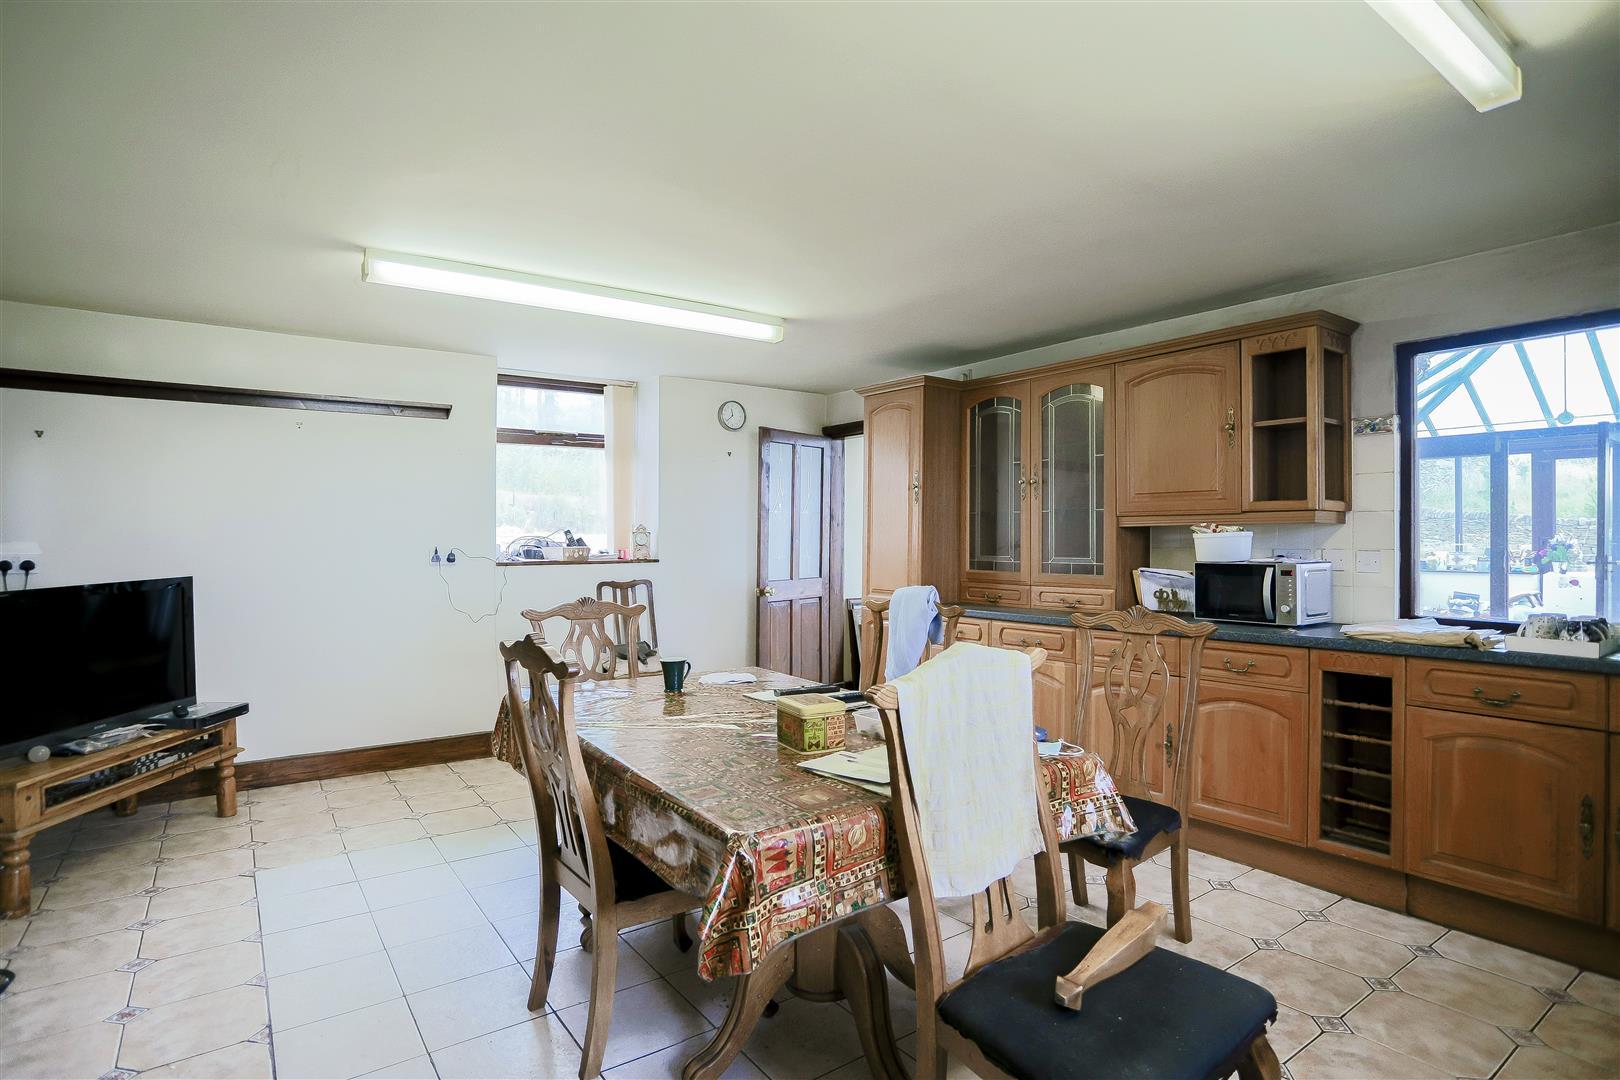 2 Bedroom Barn Conversion For Sale - IMG_2403.jpg